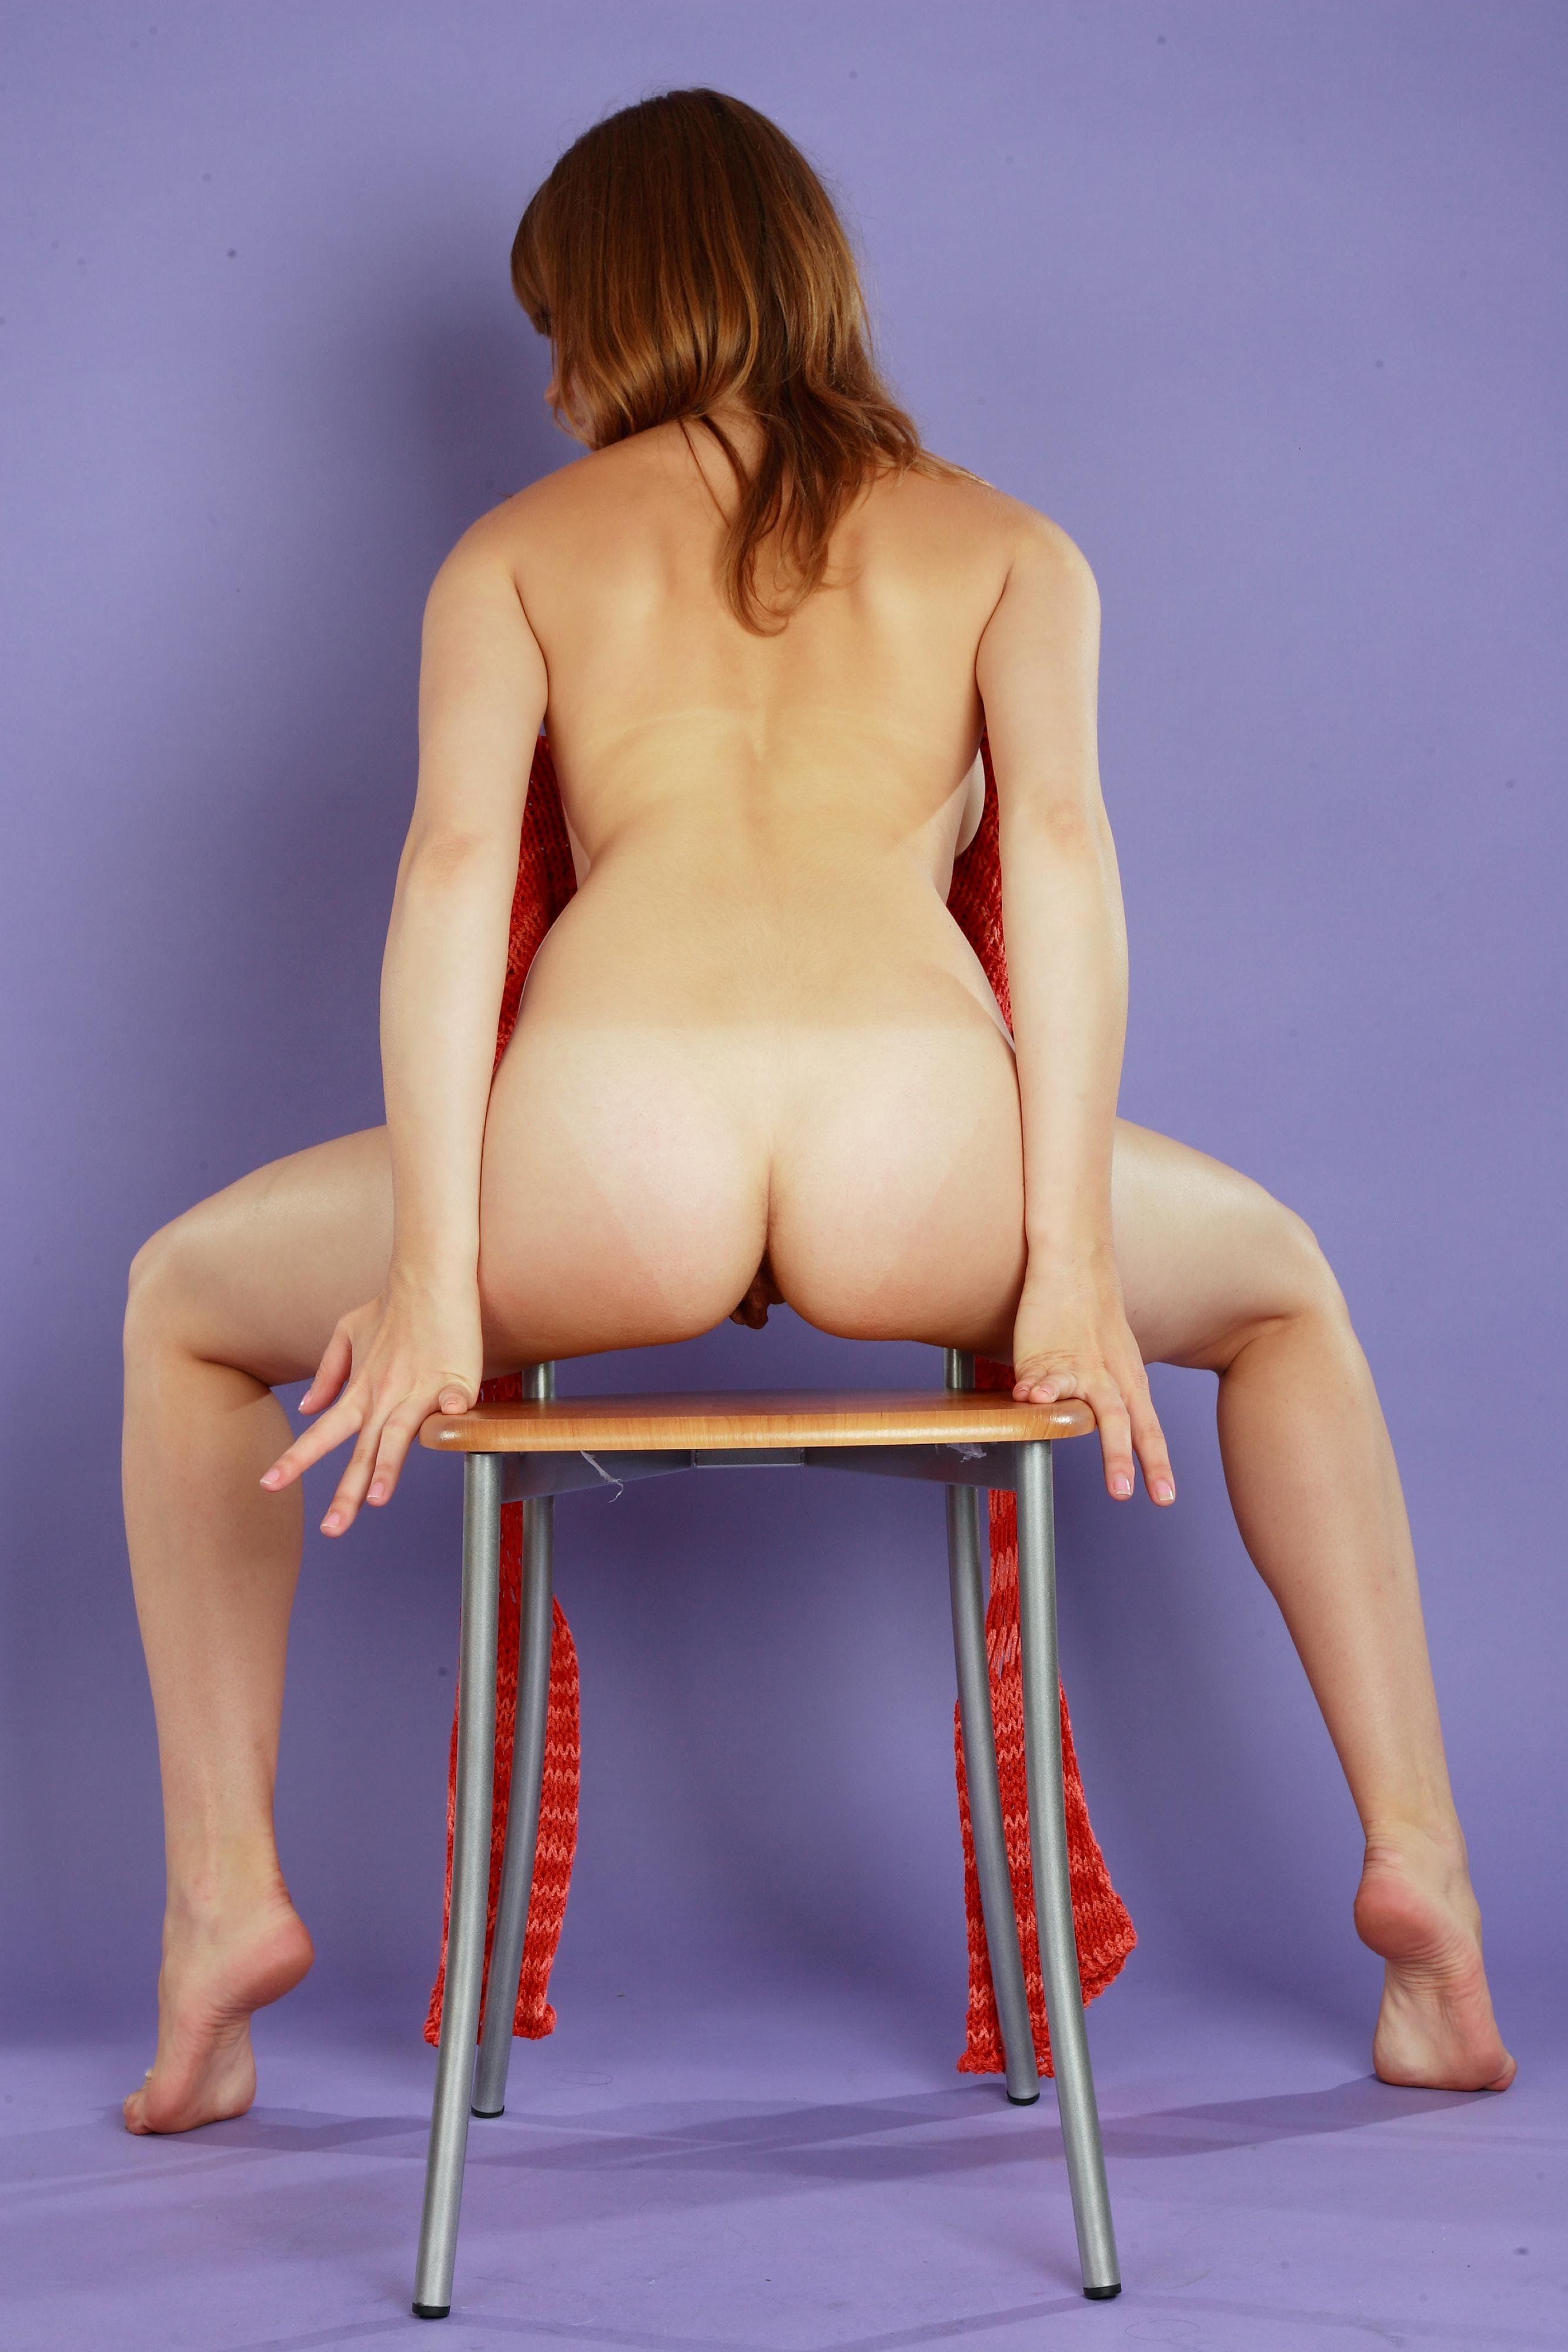 Прогибает спинку раком и раздвигает ноги - фото